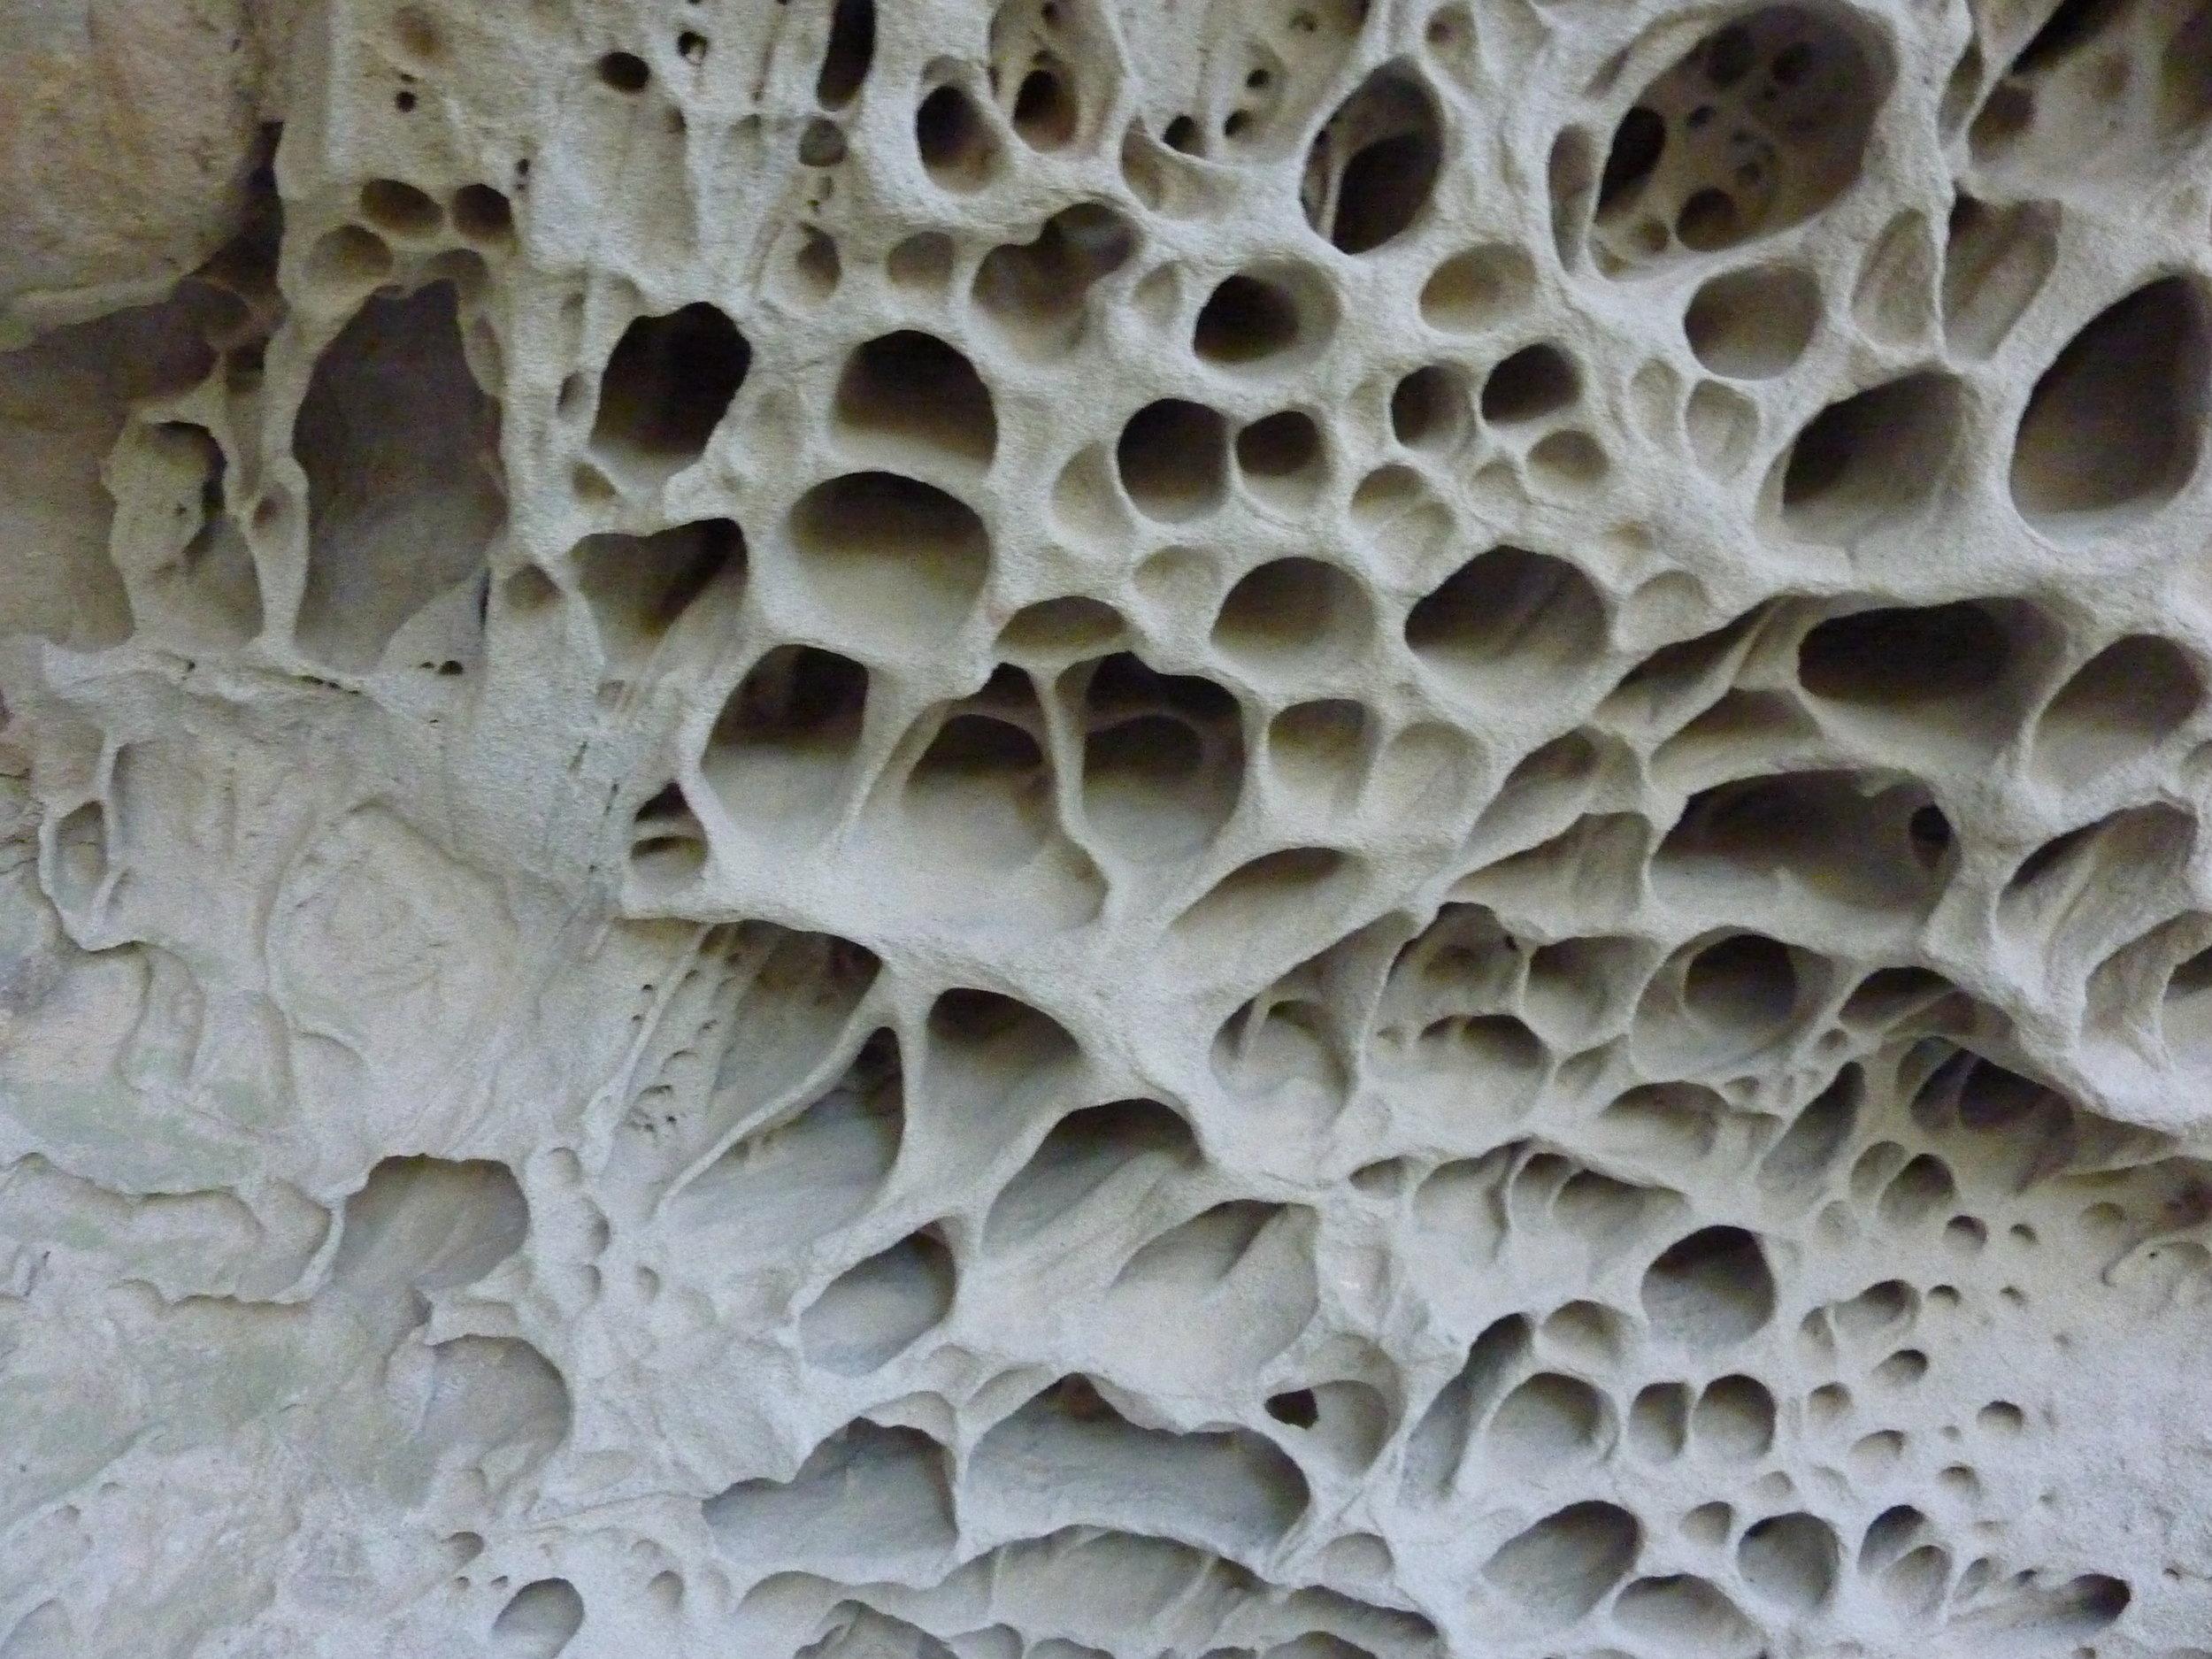 Tafoni rock formations